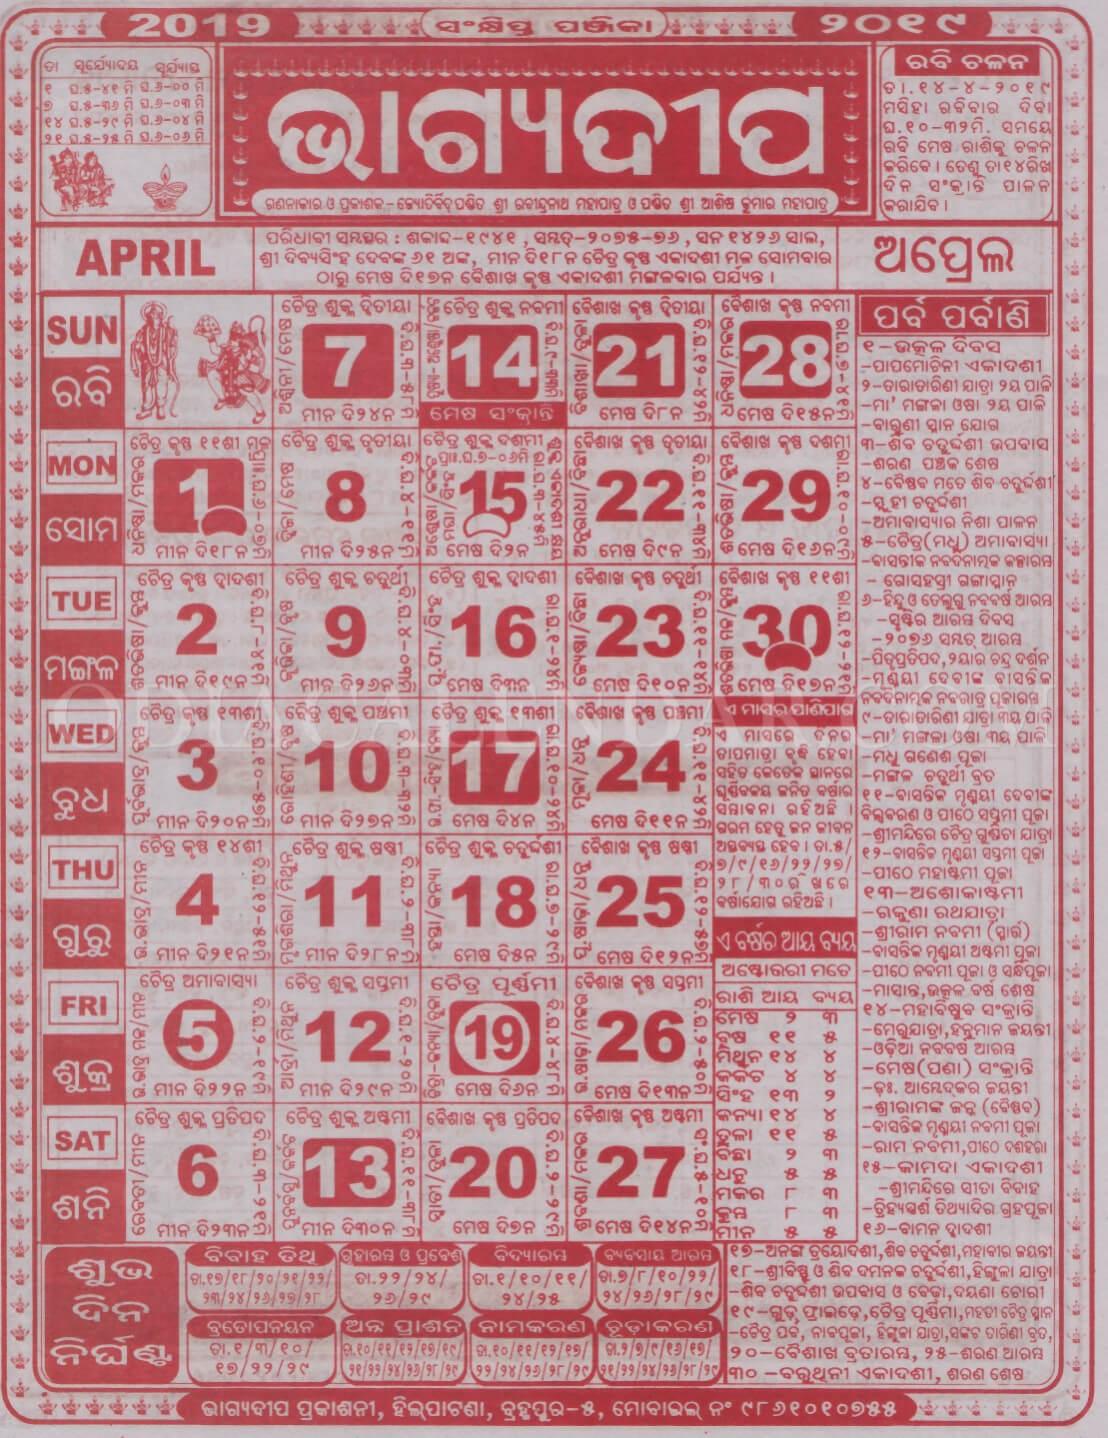 Odia Bhagyadeep Calendar 2020 April View And Download Free with regard to Bhagyadipa Odia Calendar 2020